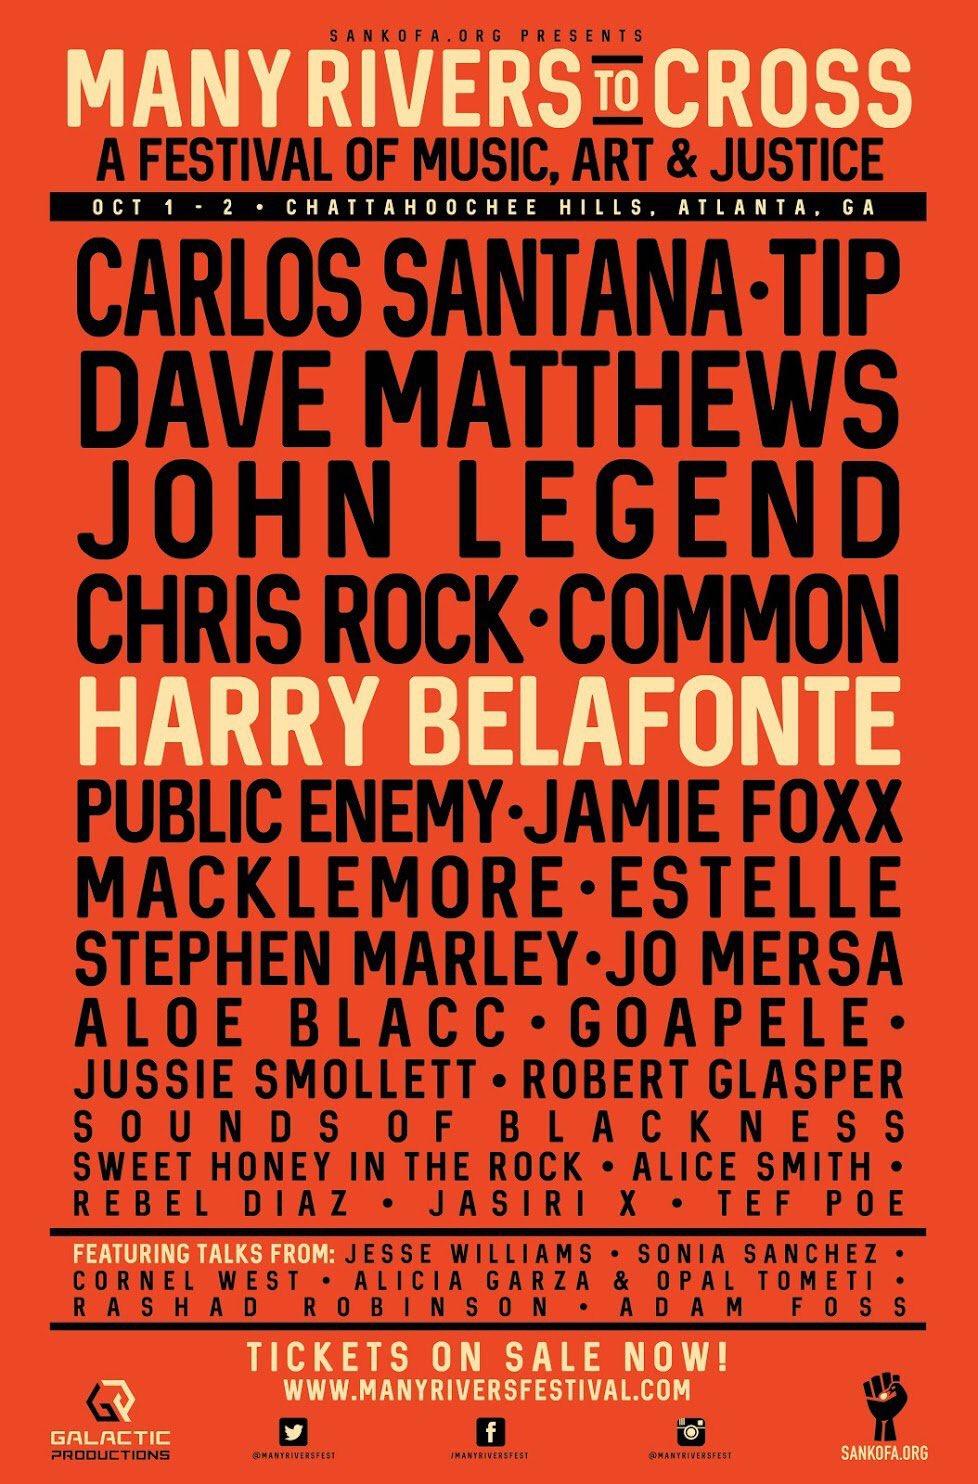 RT @sankofadotorg: Join #ManyRiversFest in ATL on Oct 1-2 with John Legend, Dave Matthews, Jesse Williams, Harry Belafonte + many more! htt…